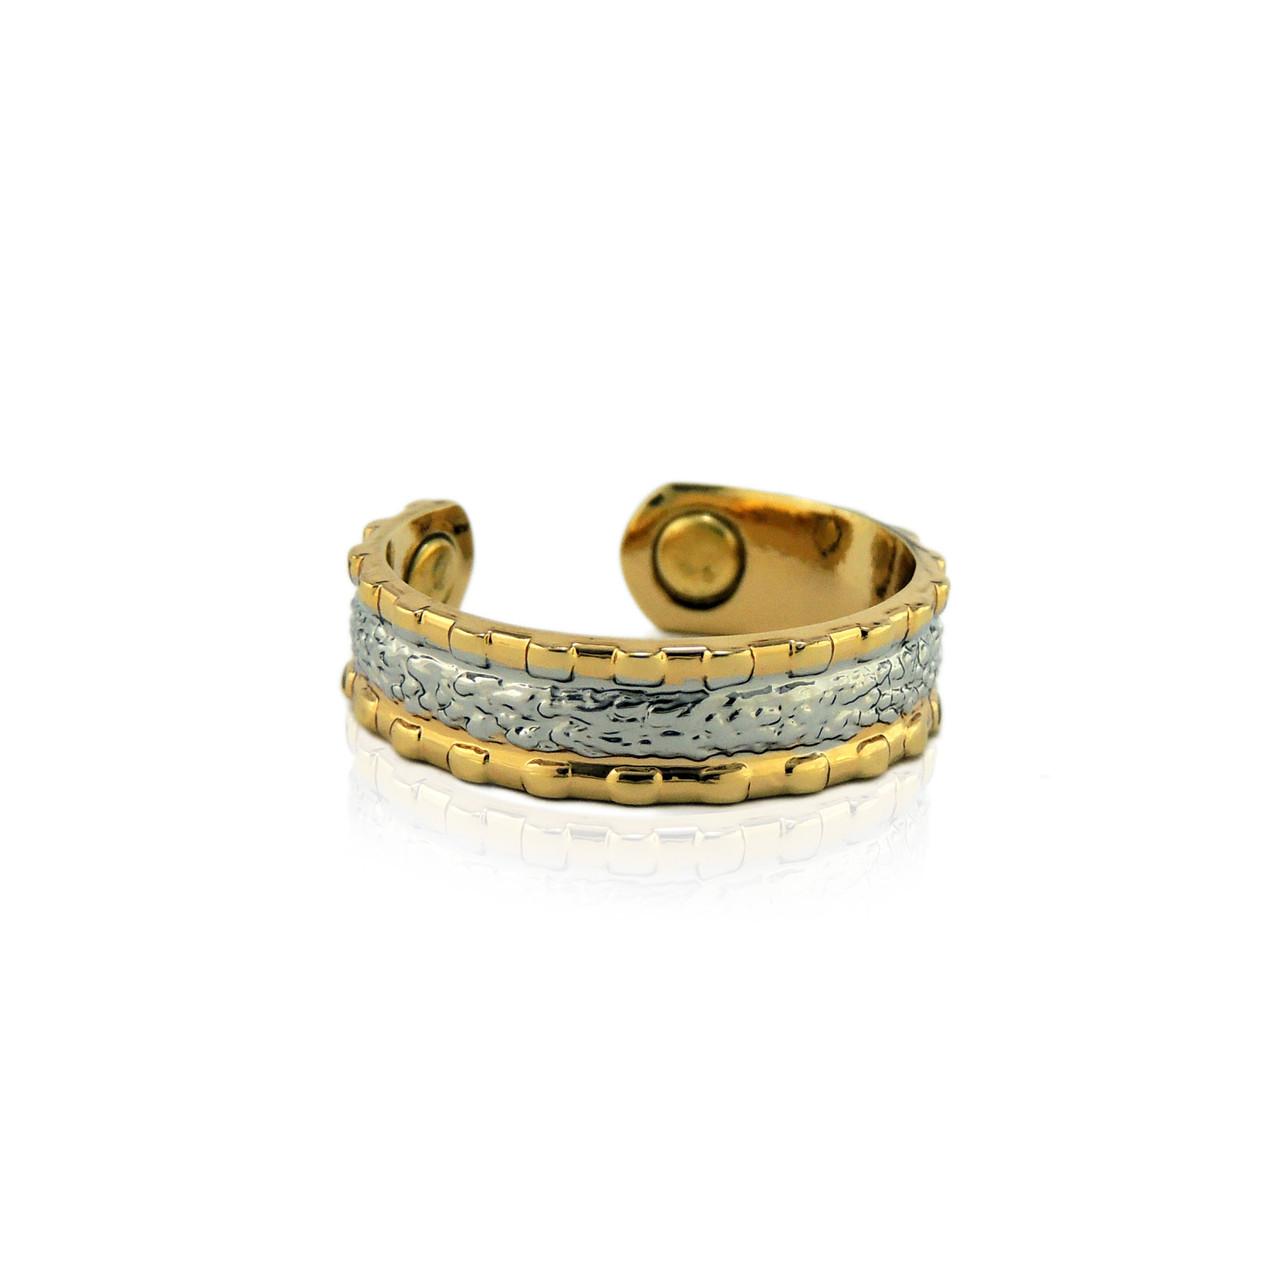 C-KCR29 Copper Ring